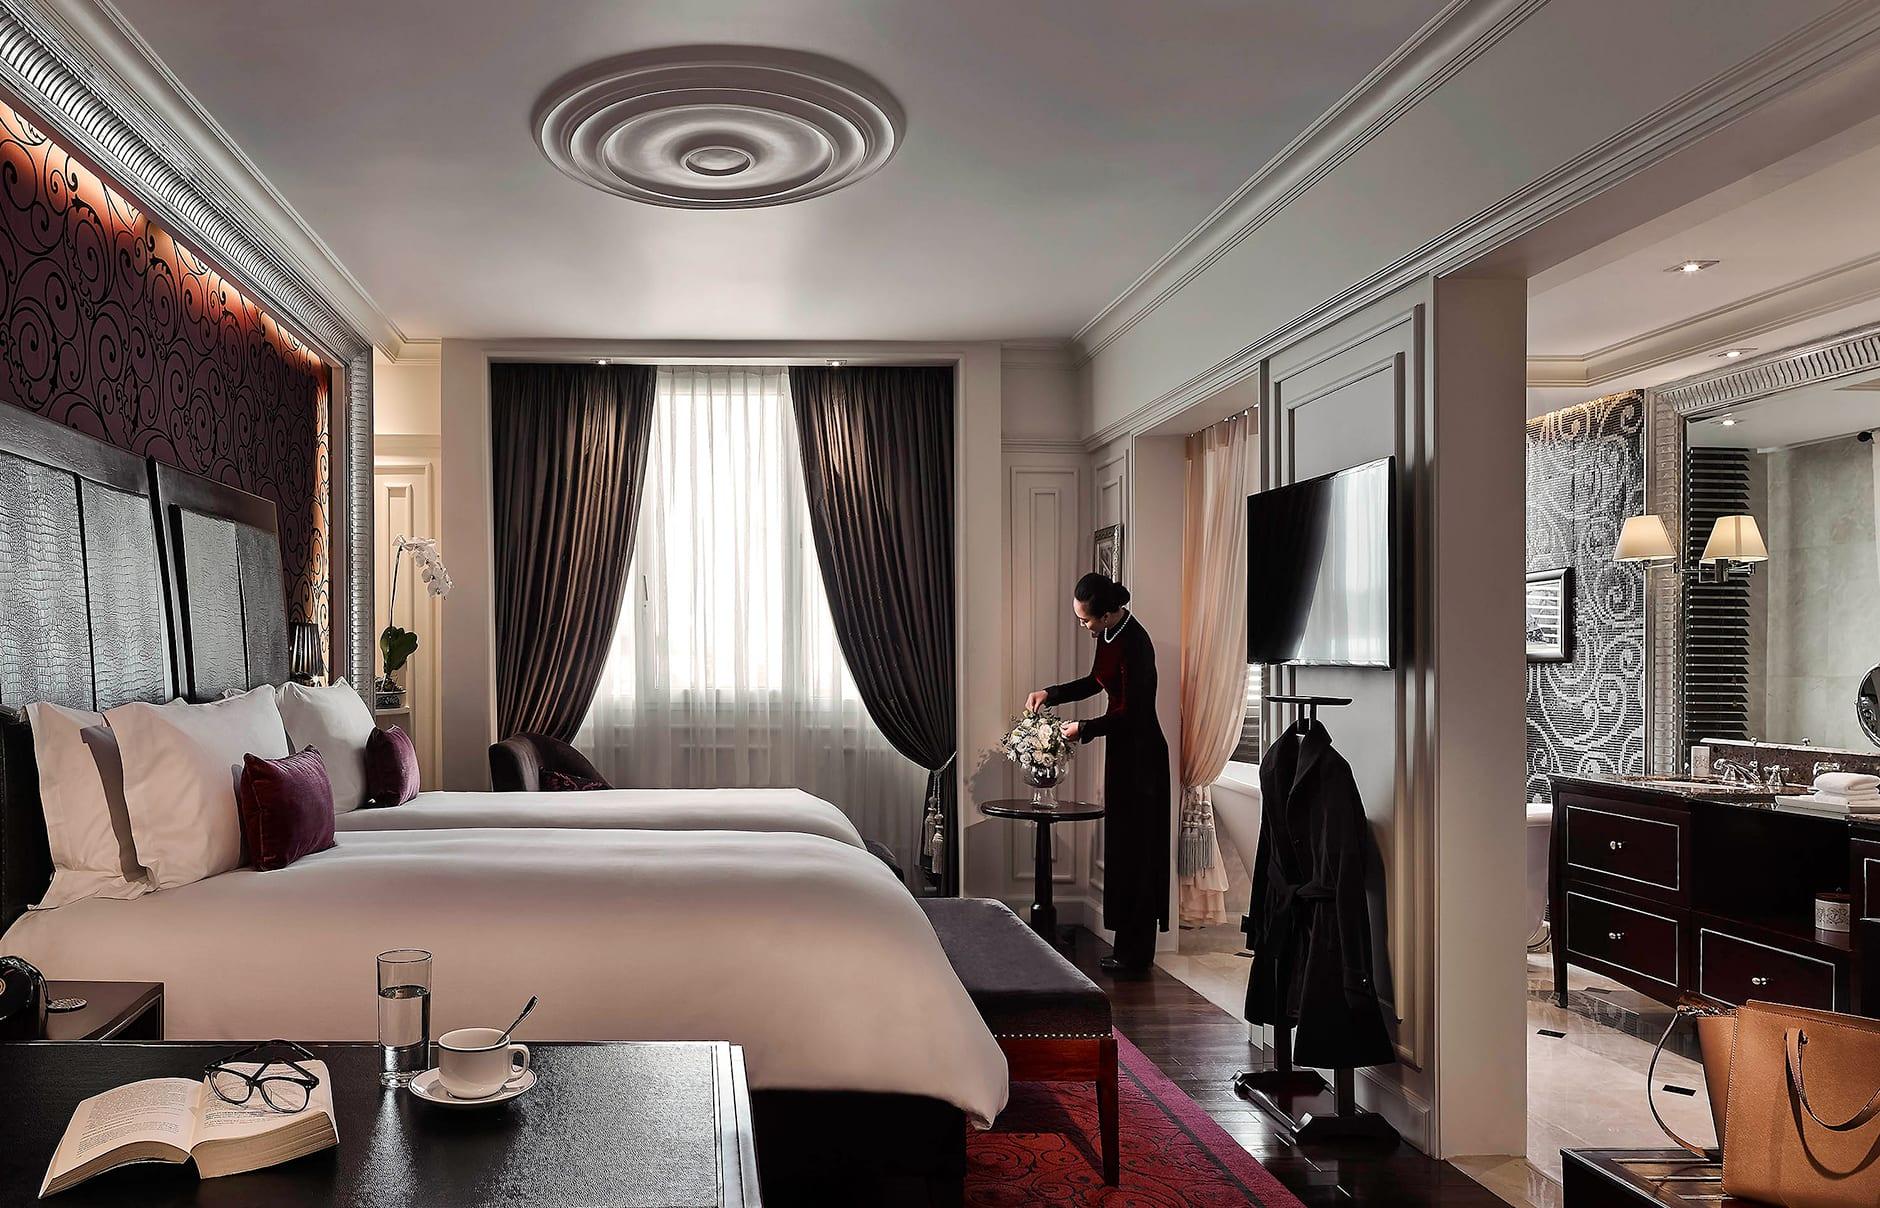 Sofitel Legend Metropole Hanoi, Vietnam. Luxury Hotel Review by TravelPlusStyle. Photo © AccorHotels